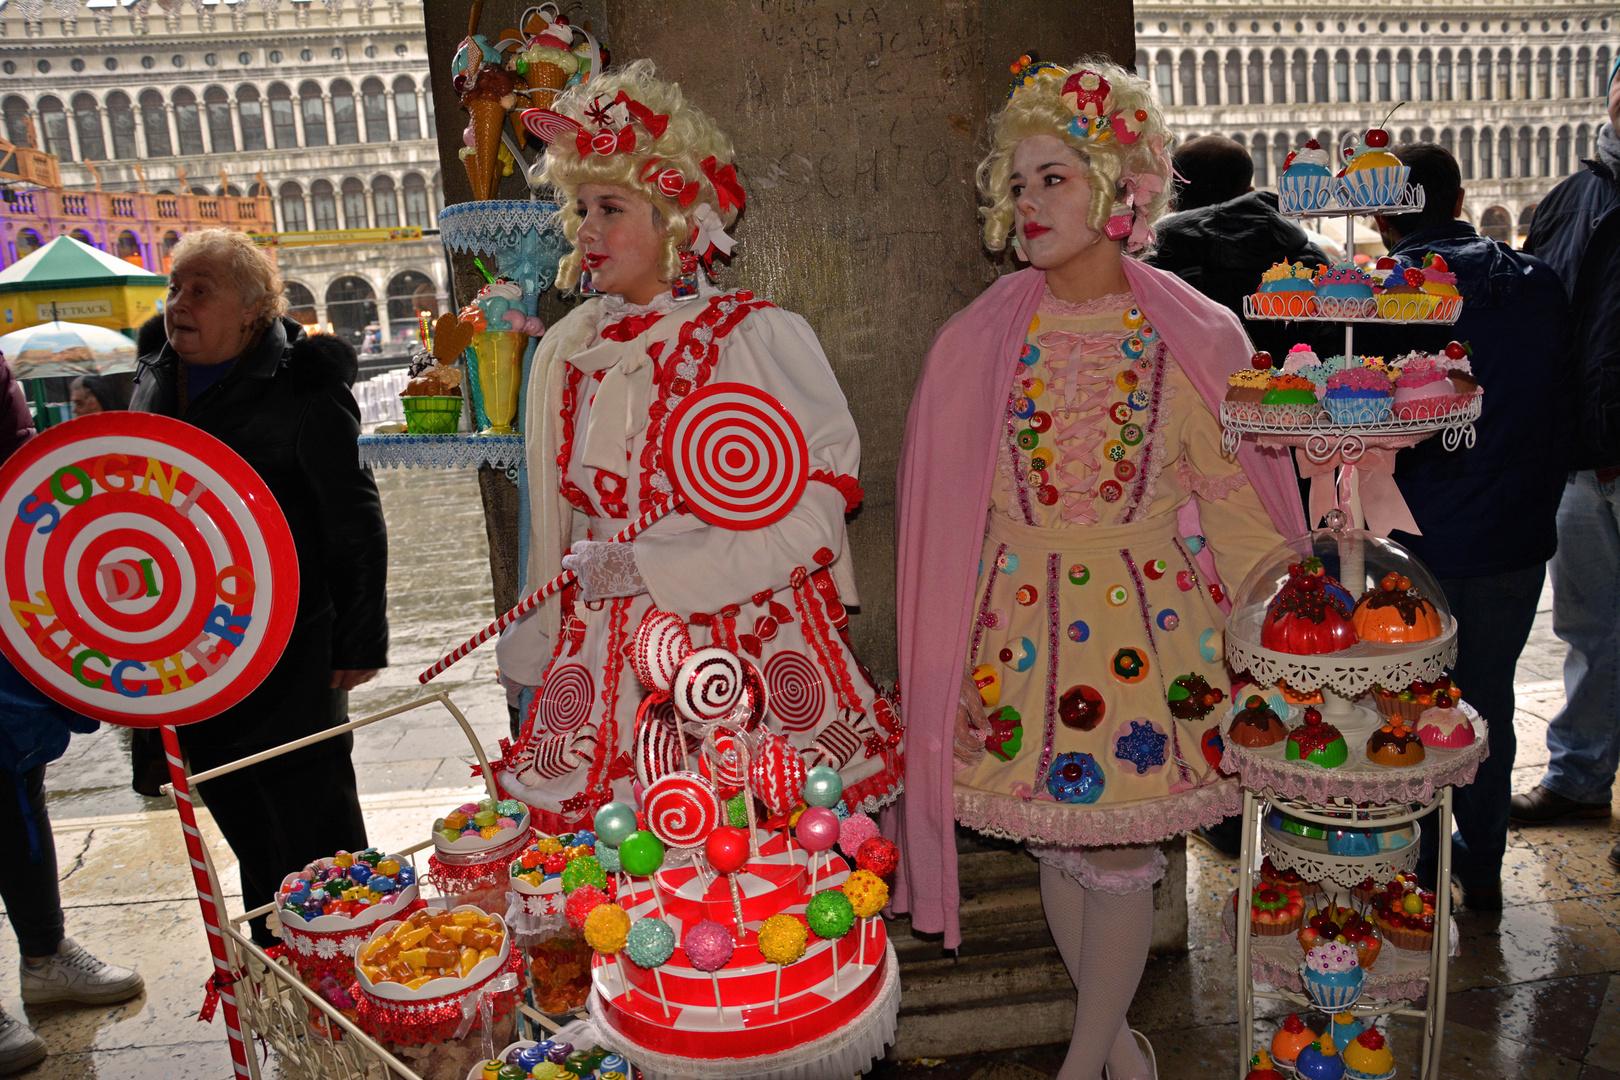 Karneval in Venedig 2014 – Part 3